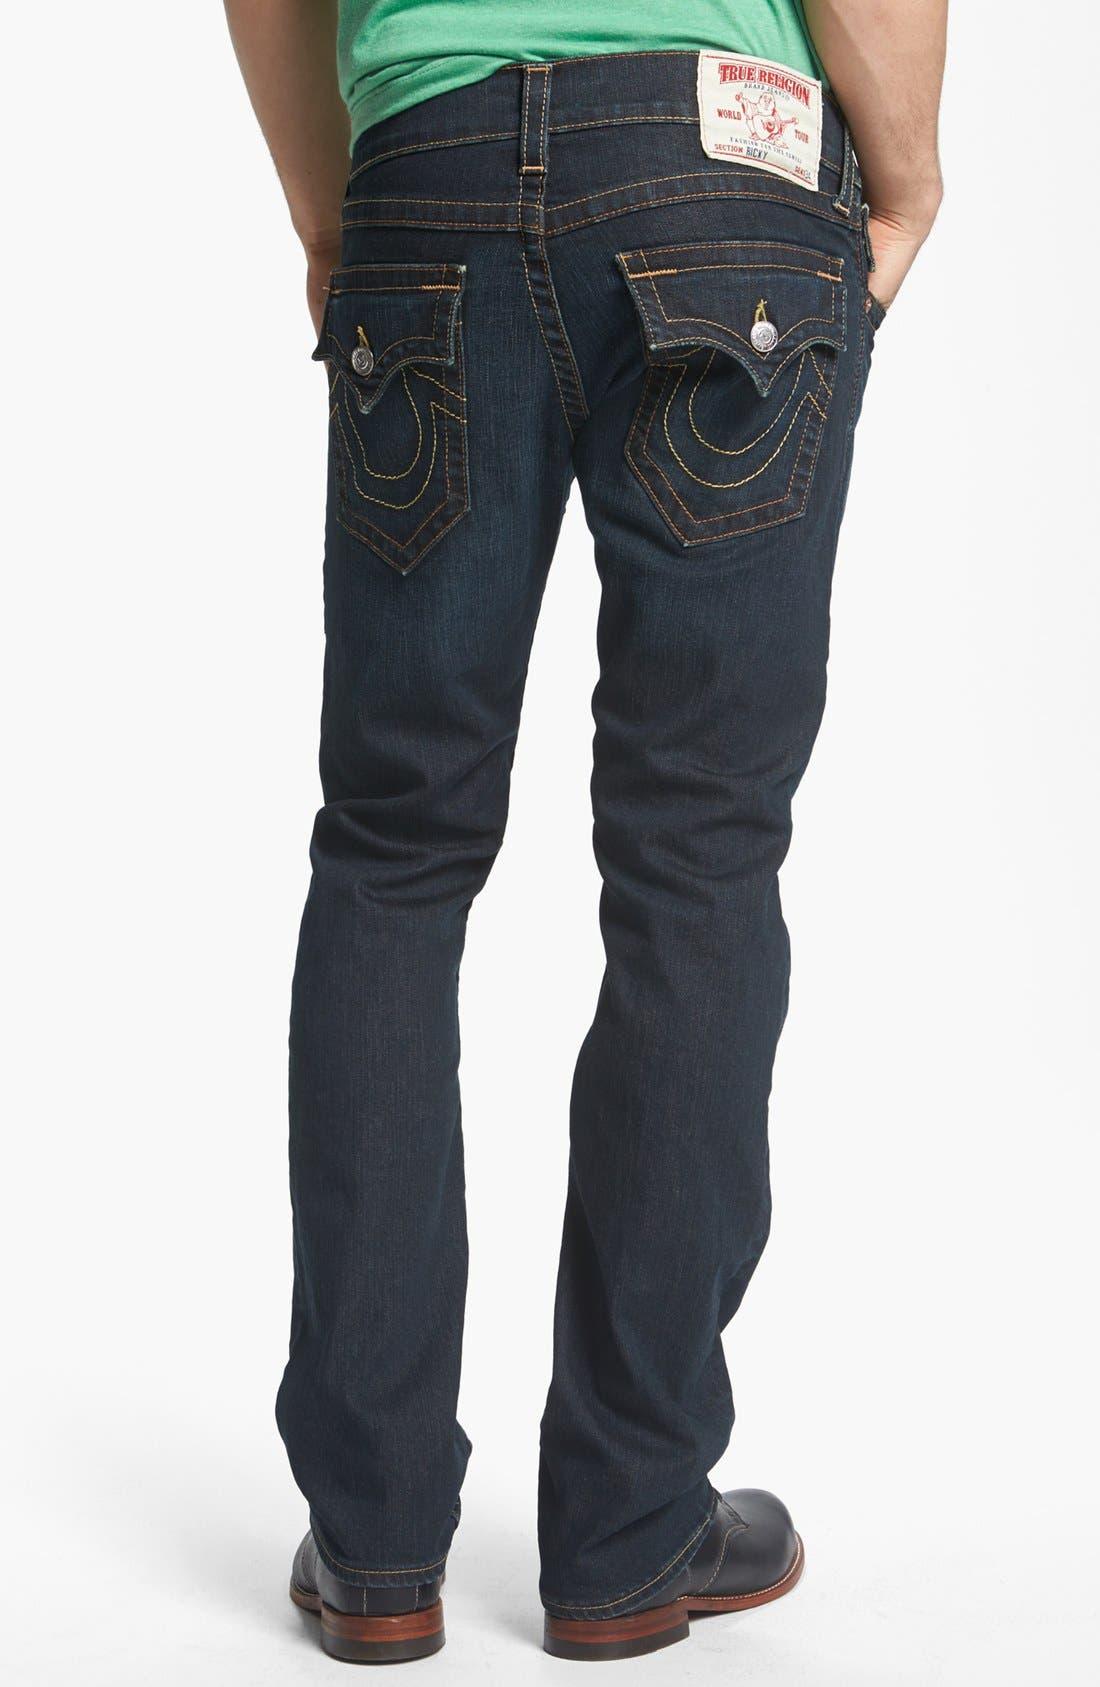 Main Image - True Religion Brand Jeans 'Ricky' Straight Leg Jeans (Jackknife)